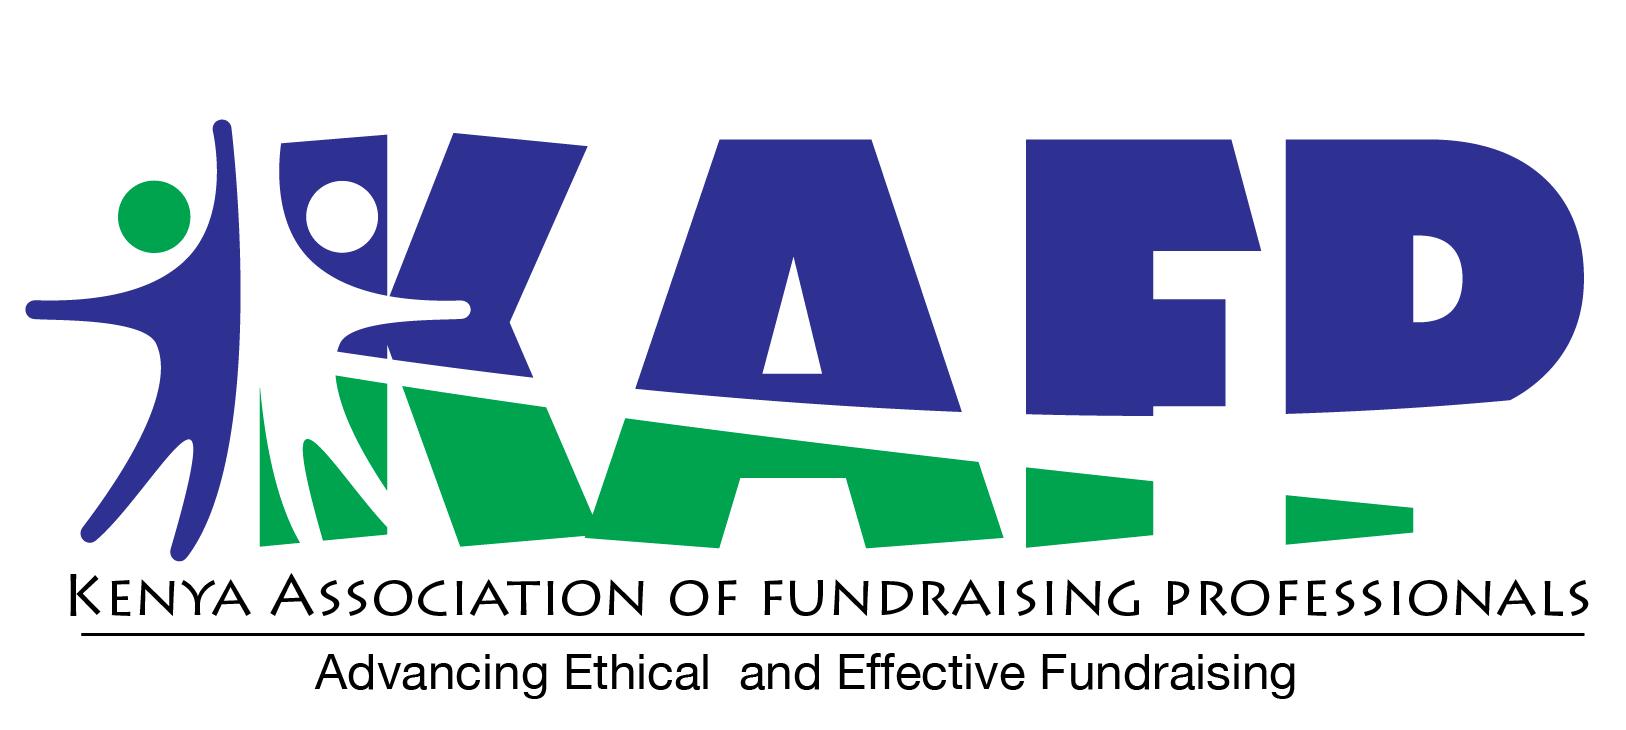 Cfre International Certified Fund Raising Executive